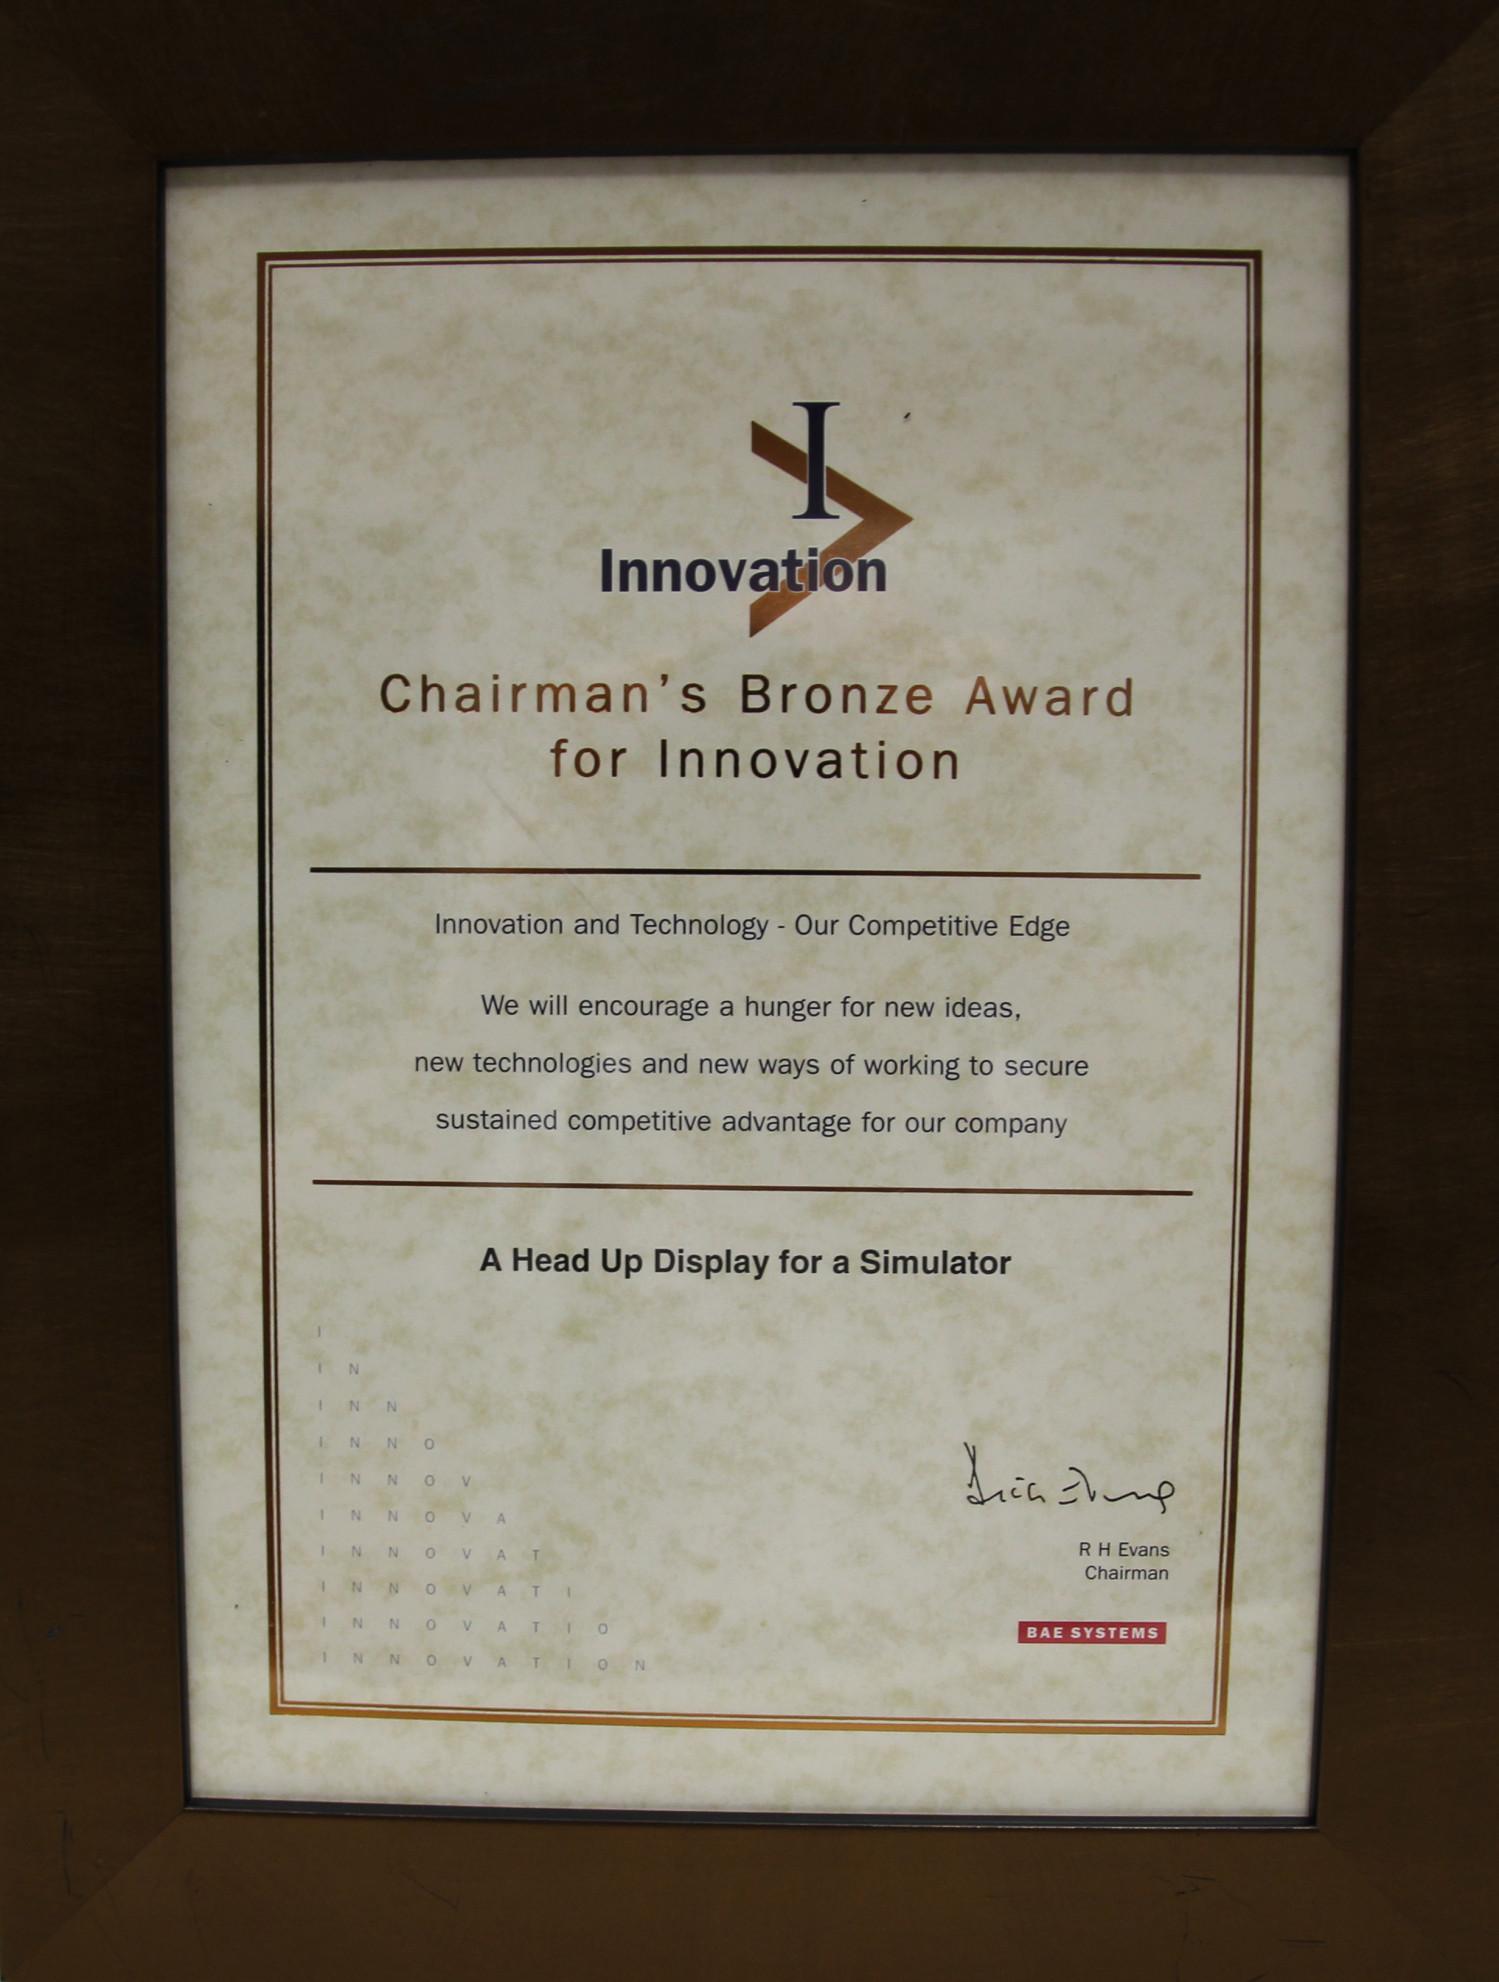 Chairman's Bronze Award for Innovation